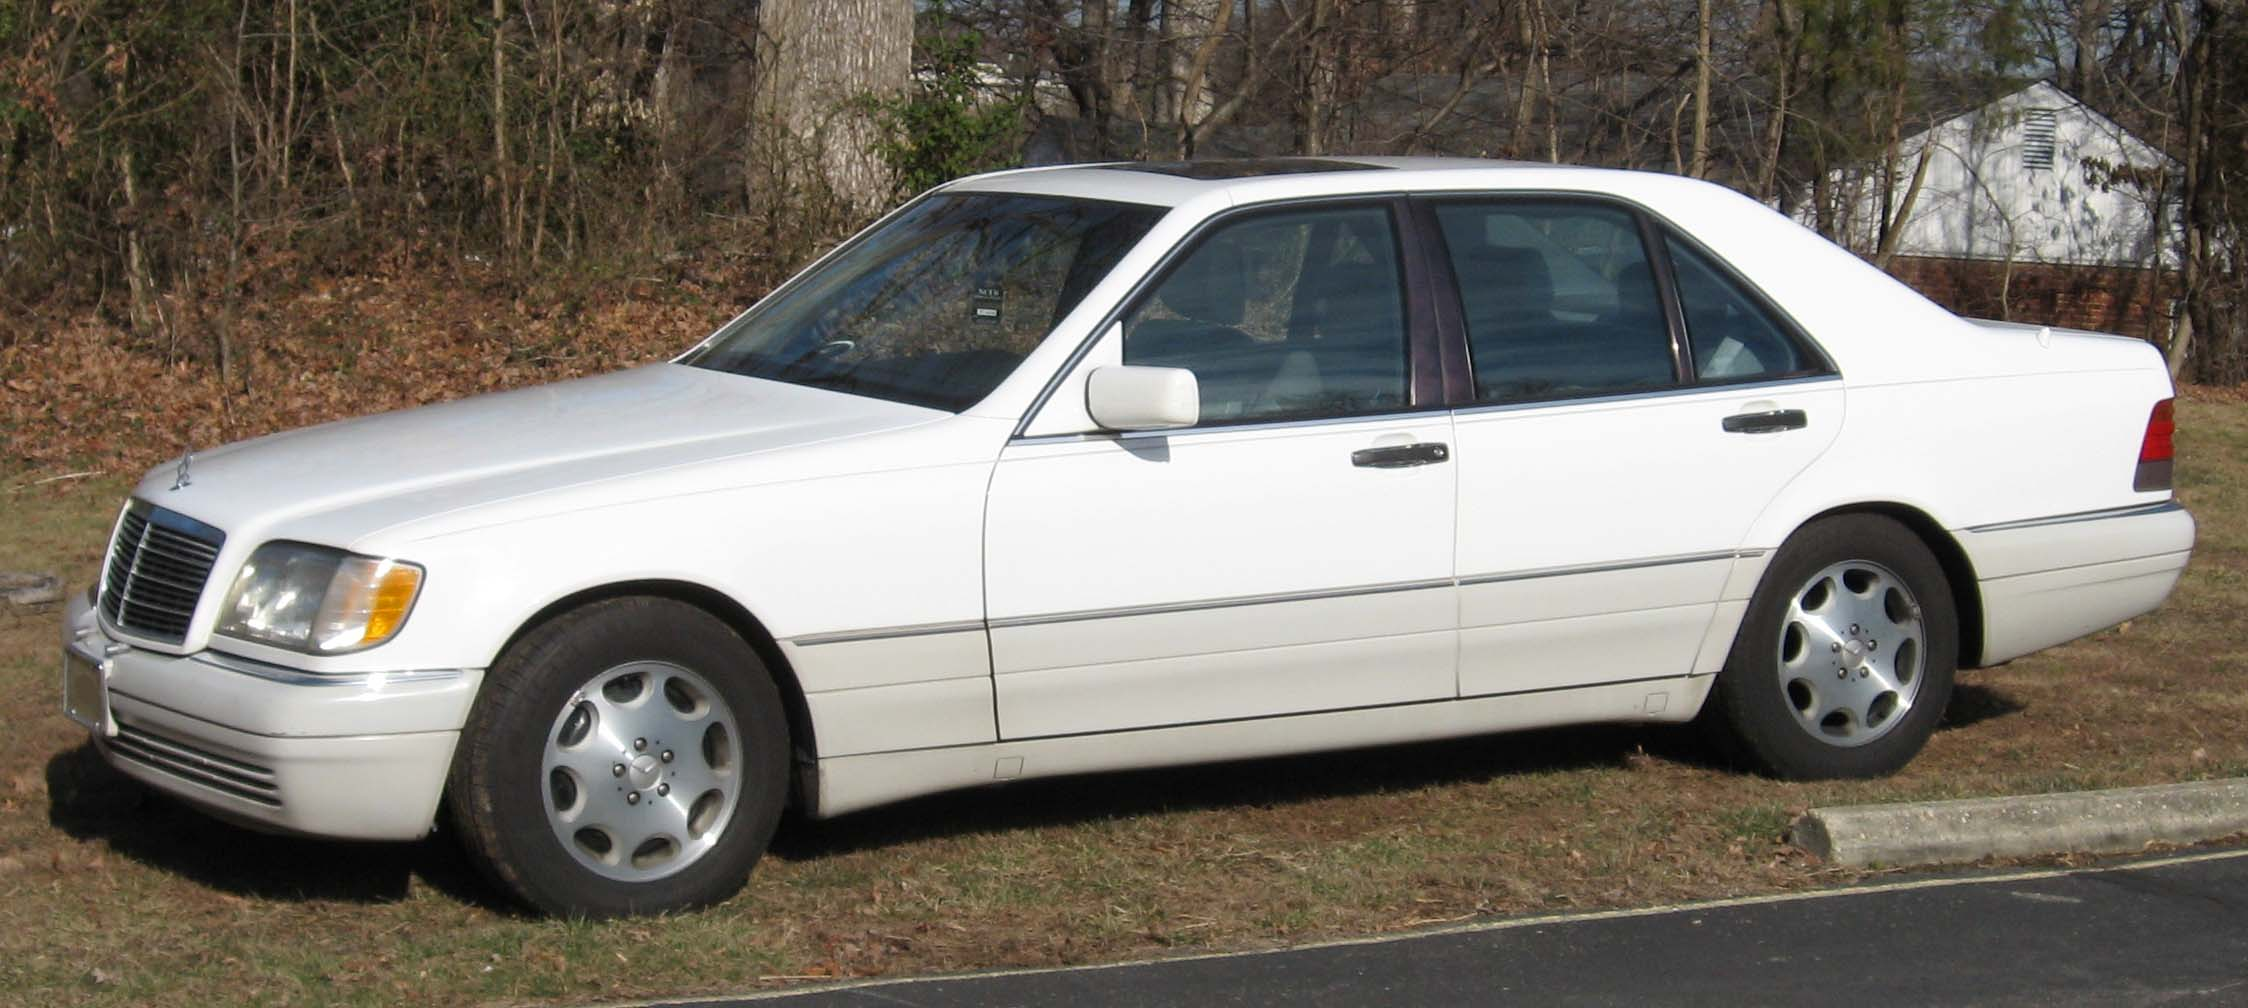 Benz s class w140 600sel or s600 m120 394 hp w140 information - Mercedes Benz S320 Sedan